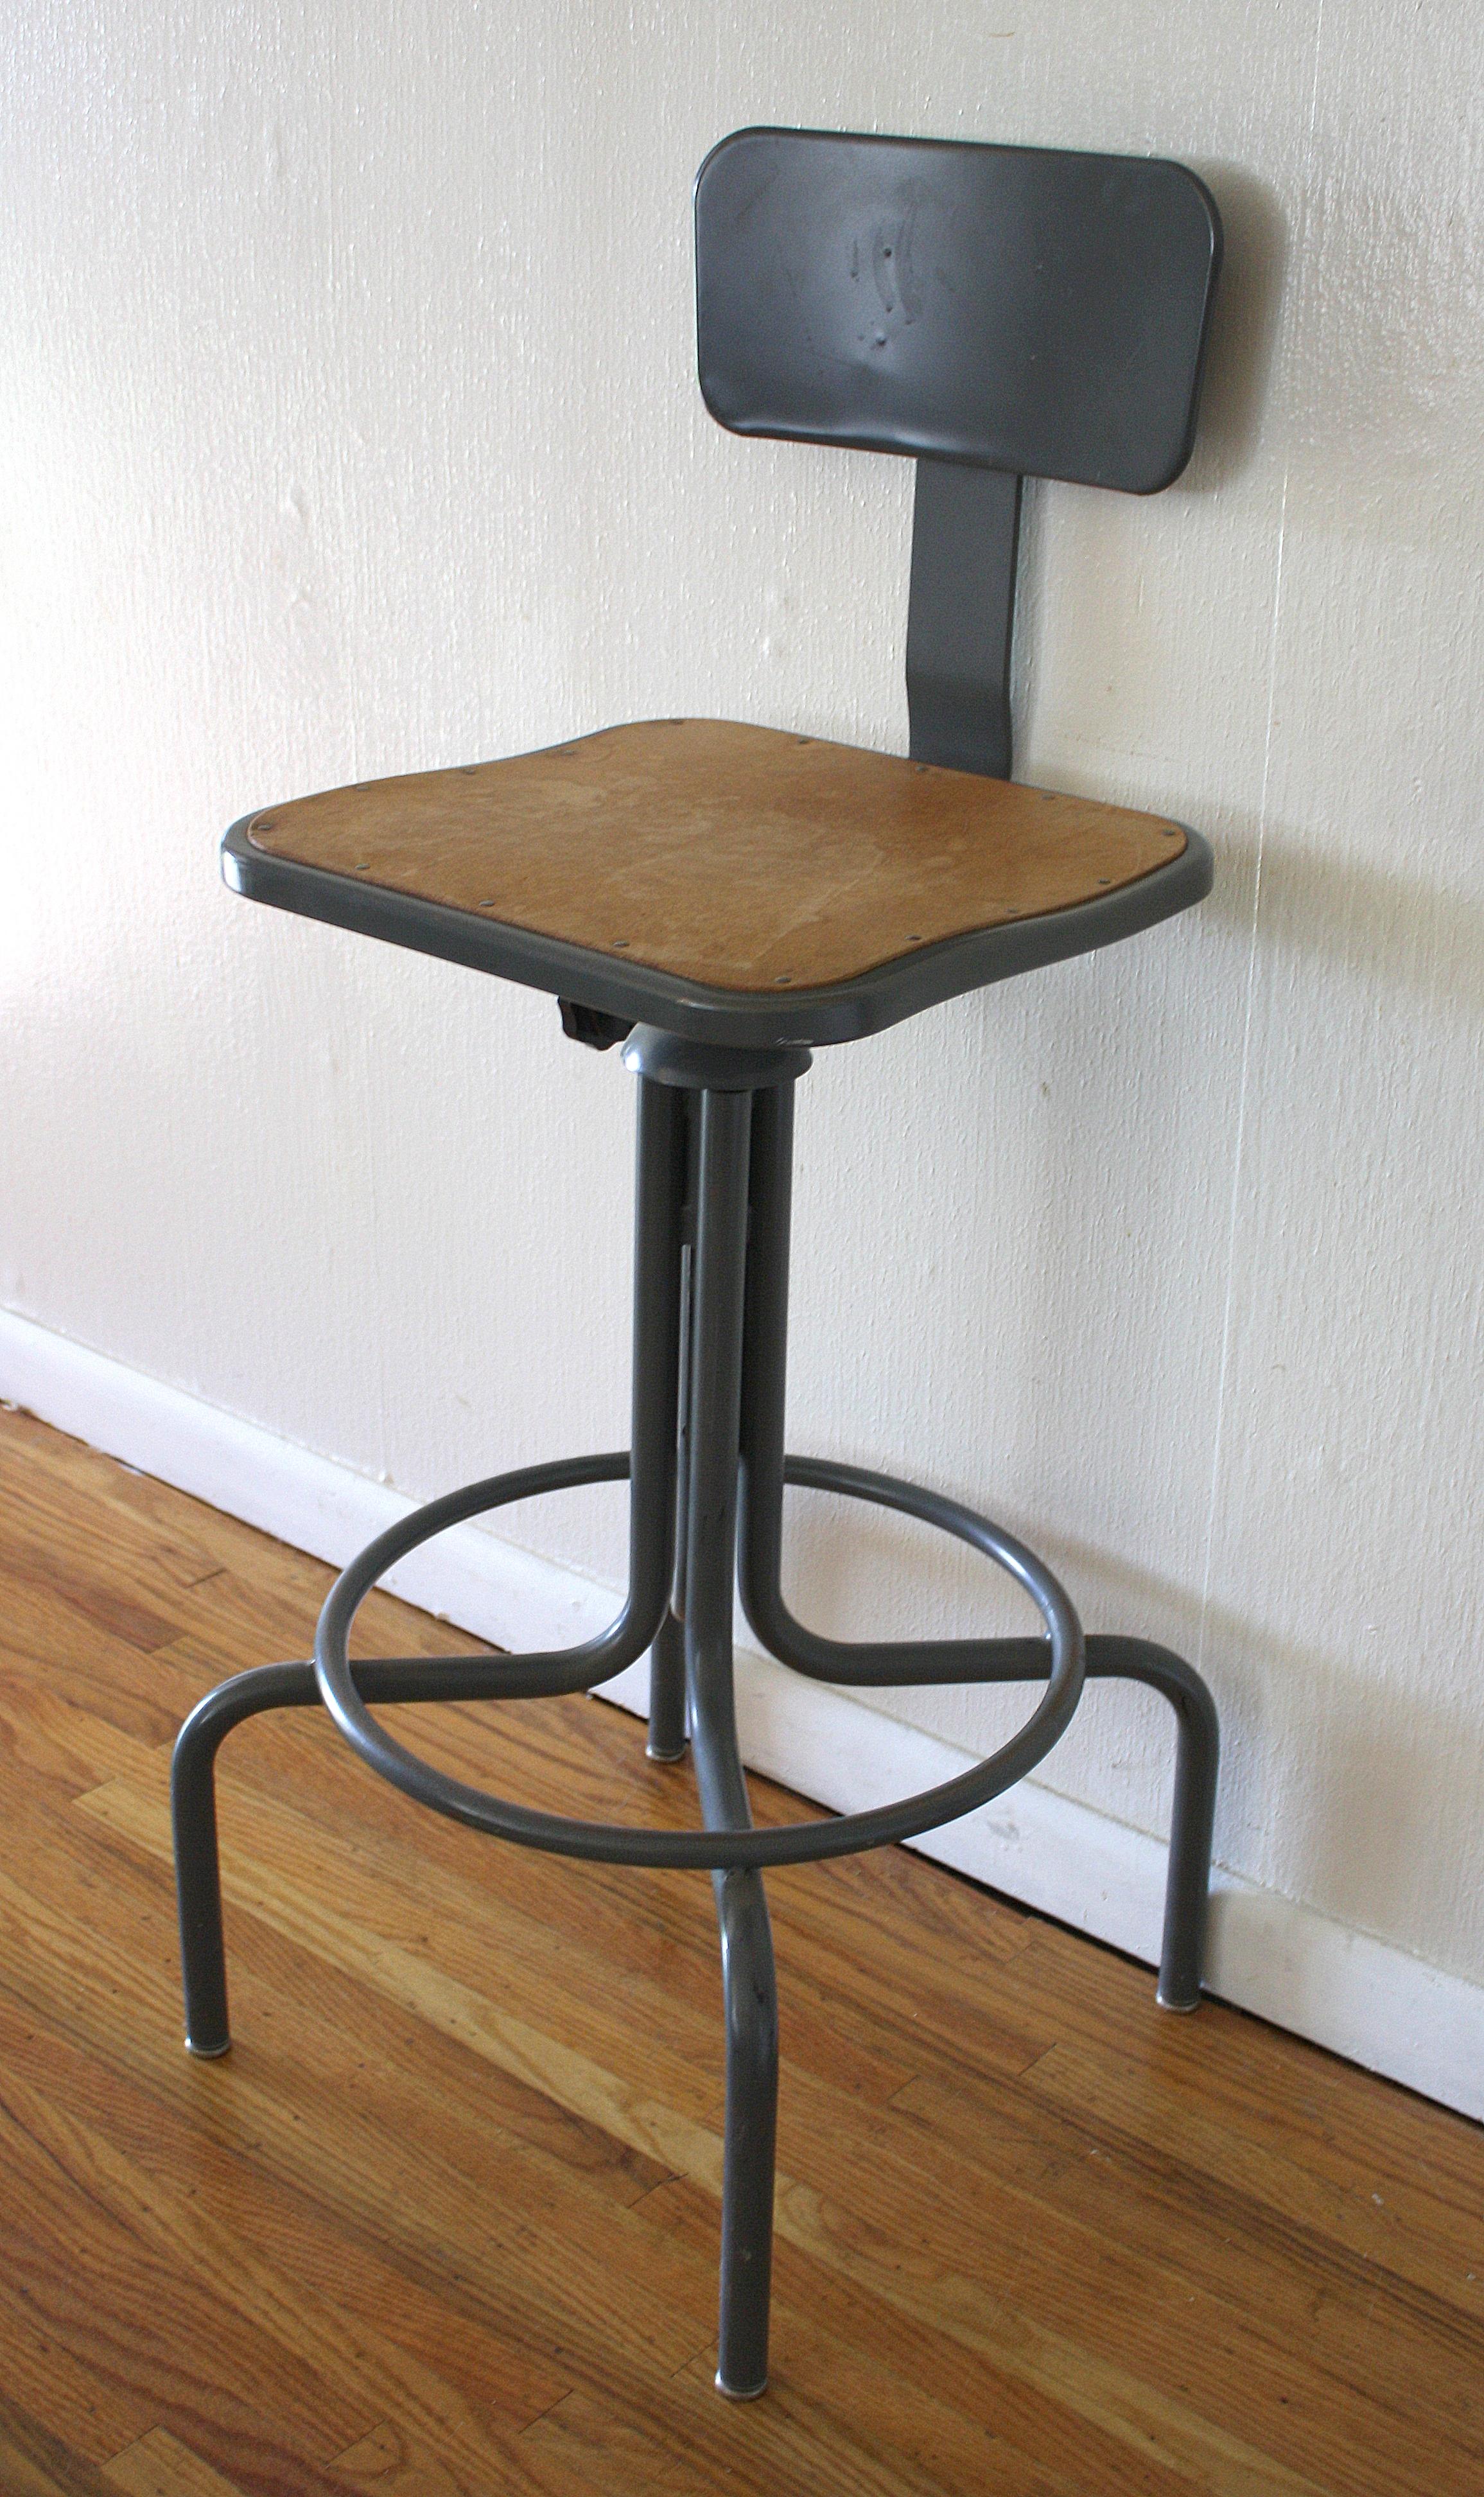 Antique Industrial Drafting Stool  Picked Vintage